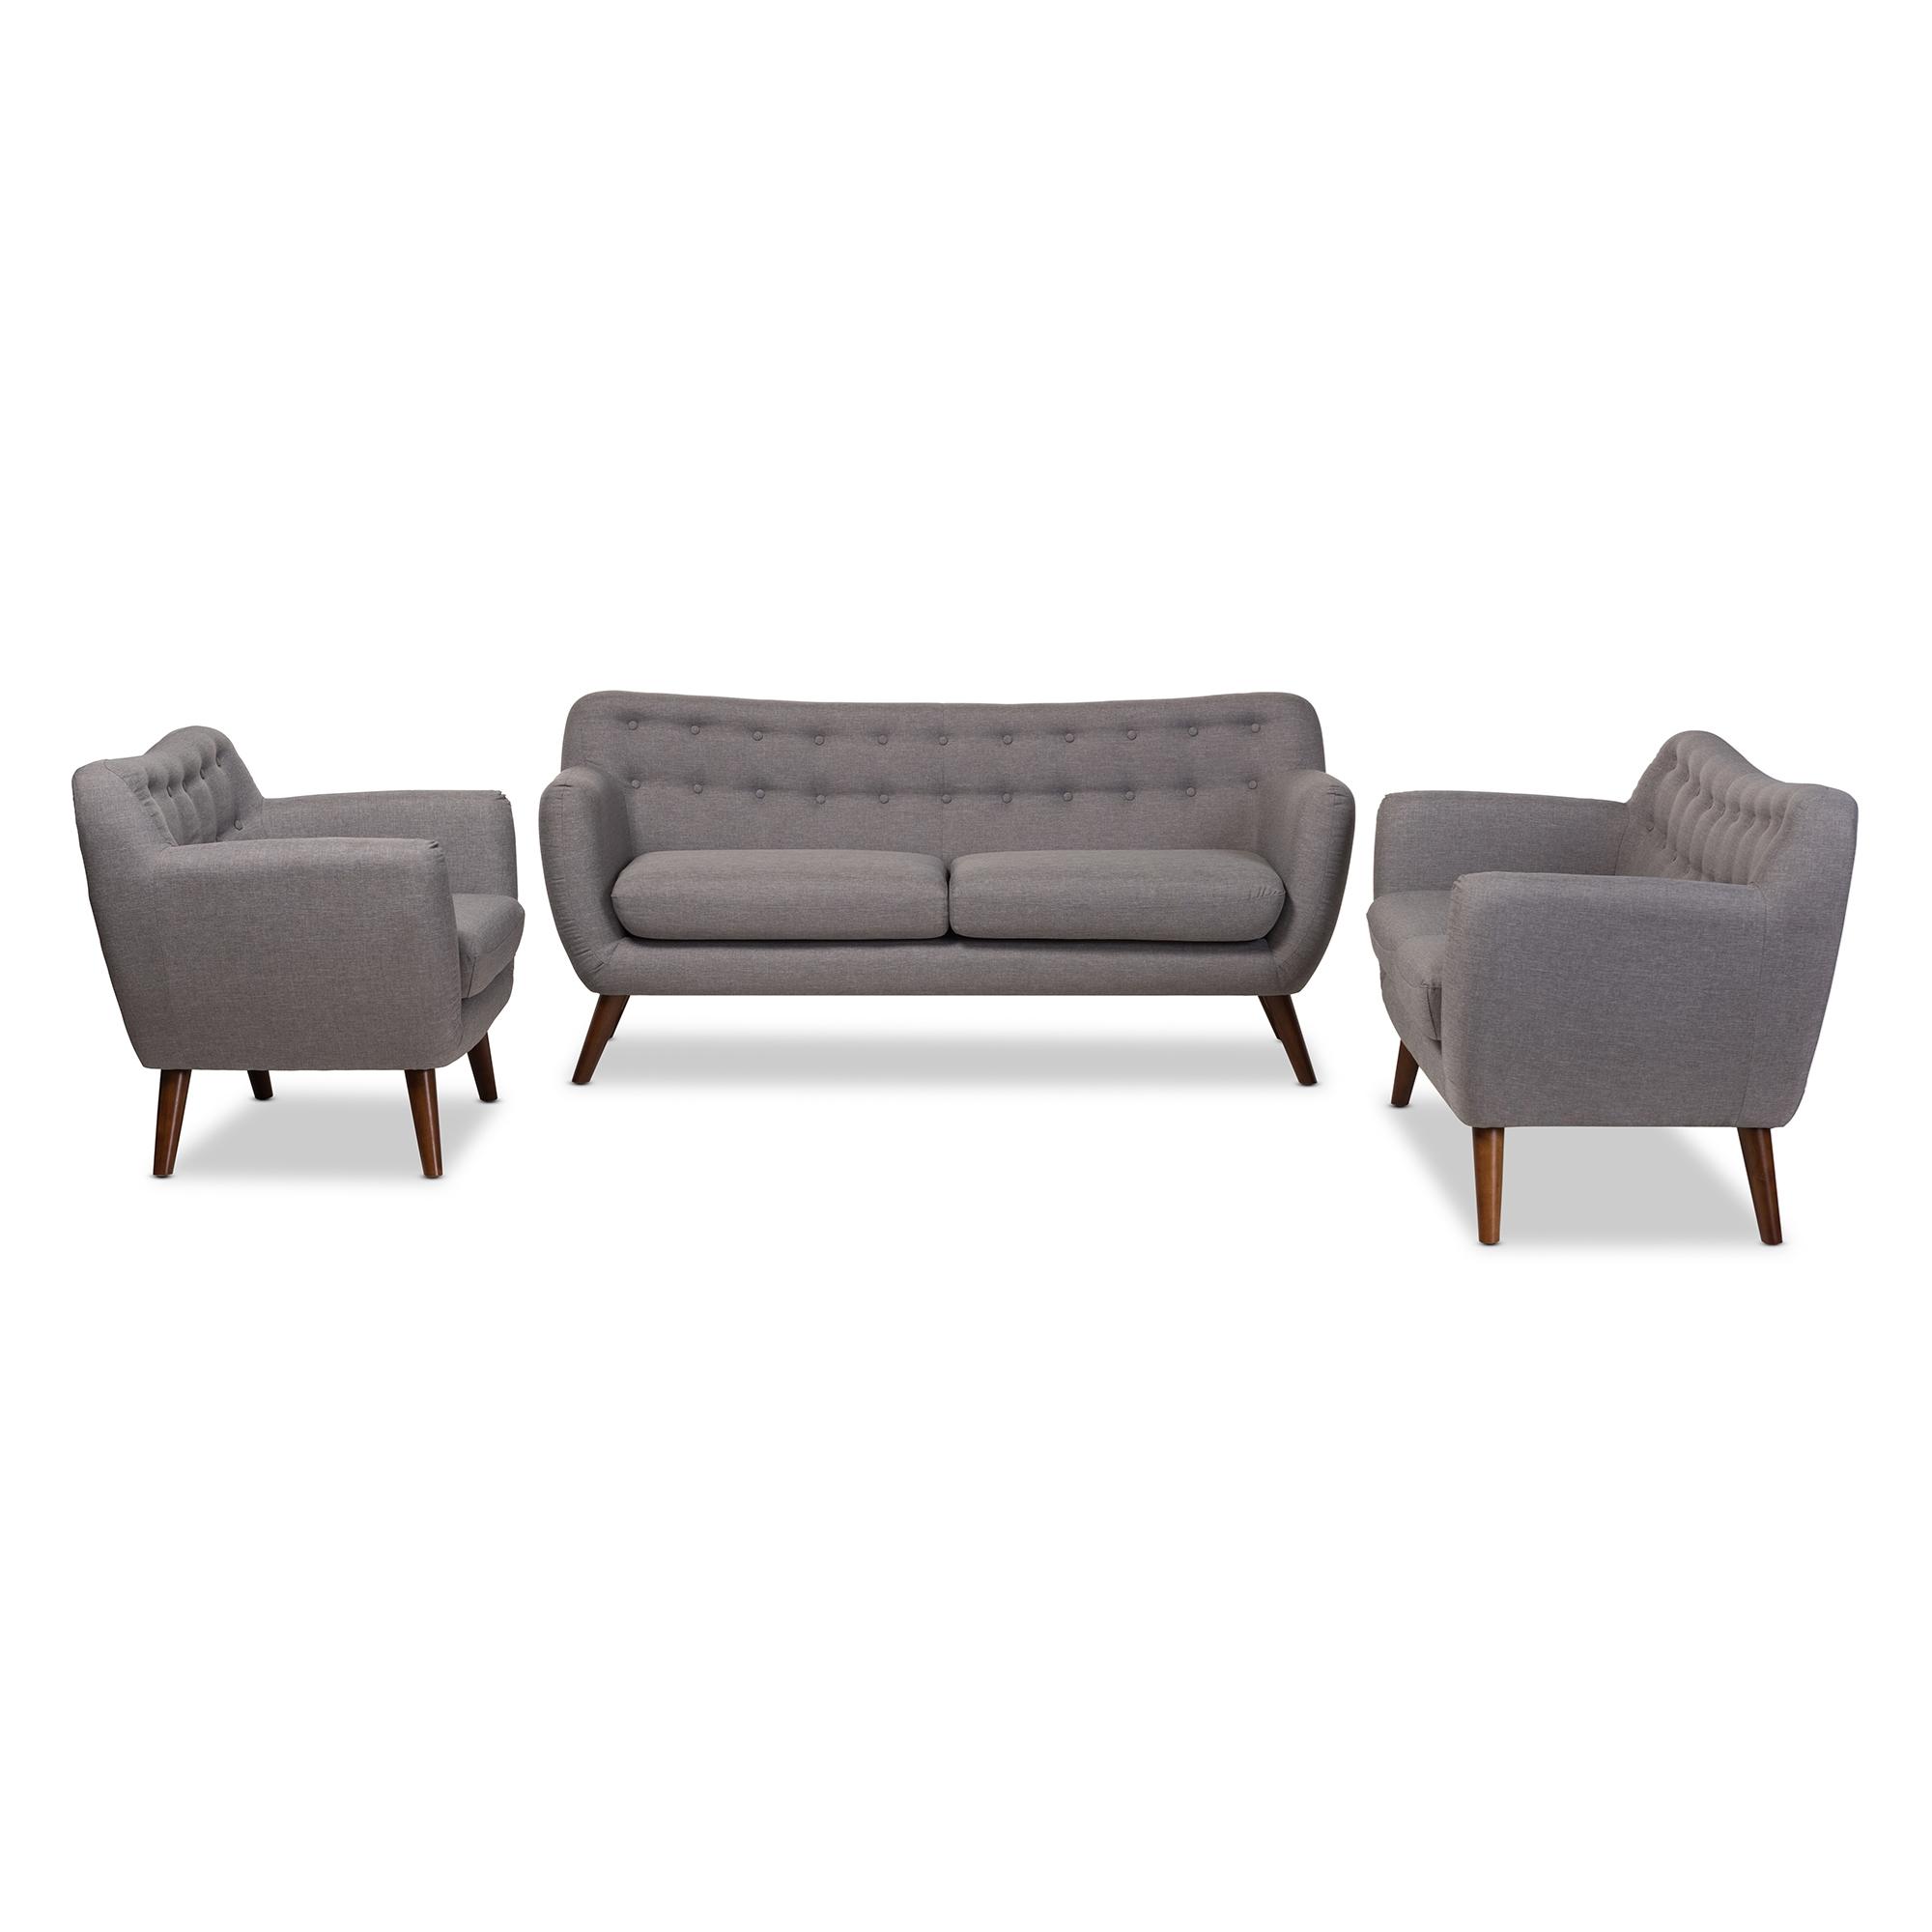 Baxton Studio Harper Mid Century Modern Light Grey Fabric Upholstered  Walnut Wood Button Tufted 3 Piece Sofa Set